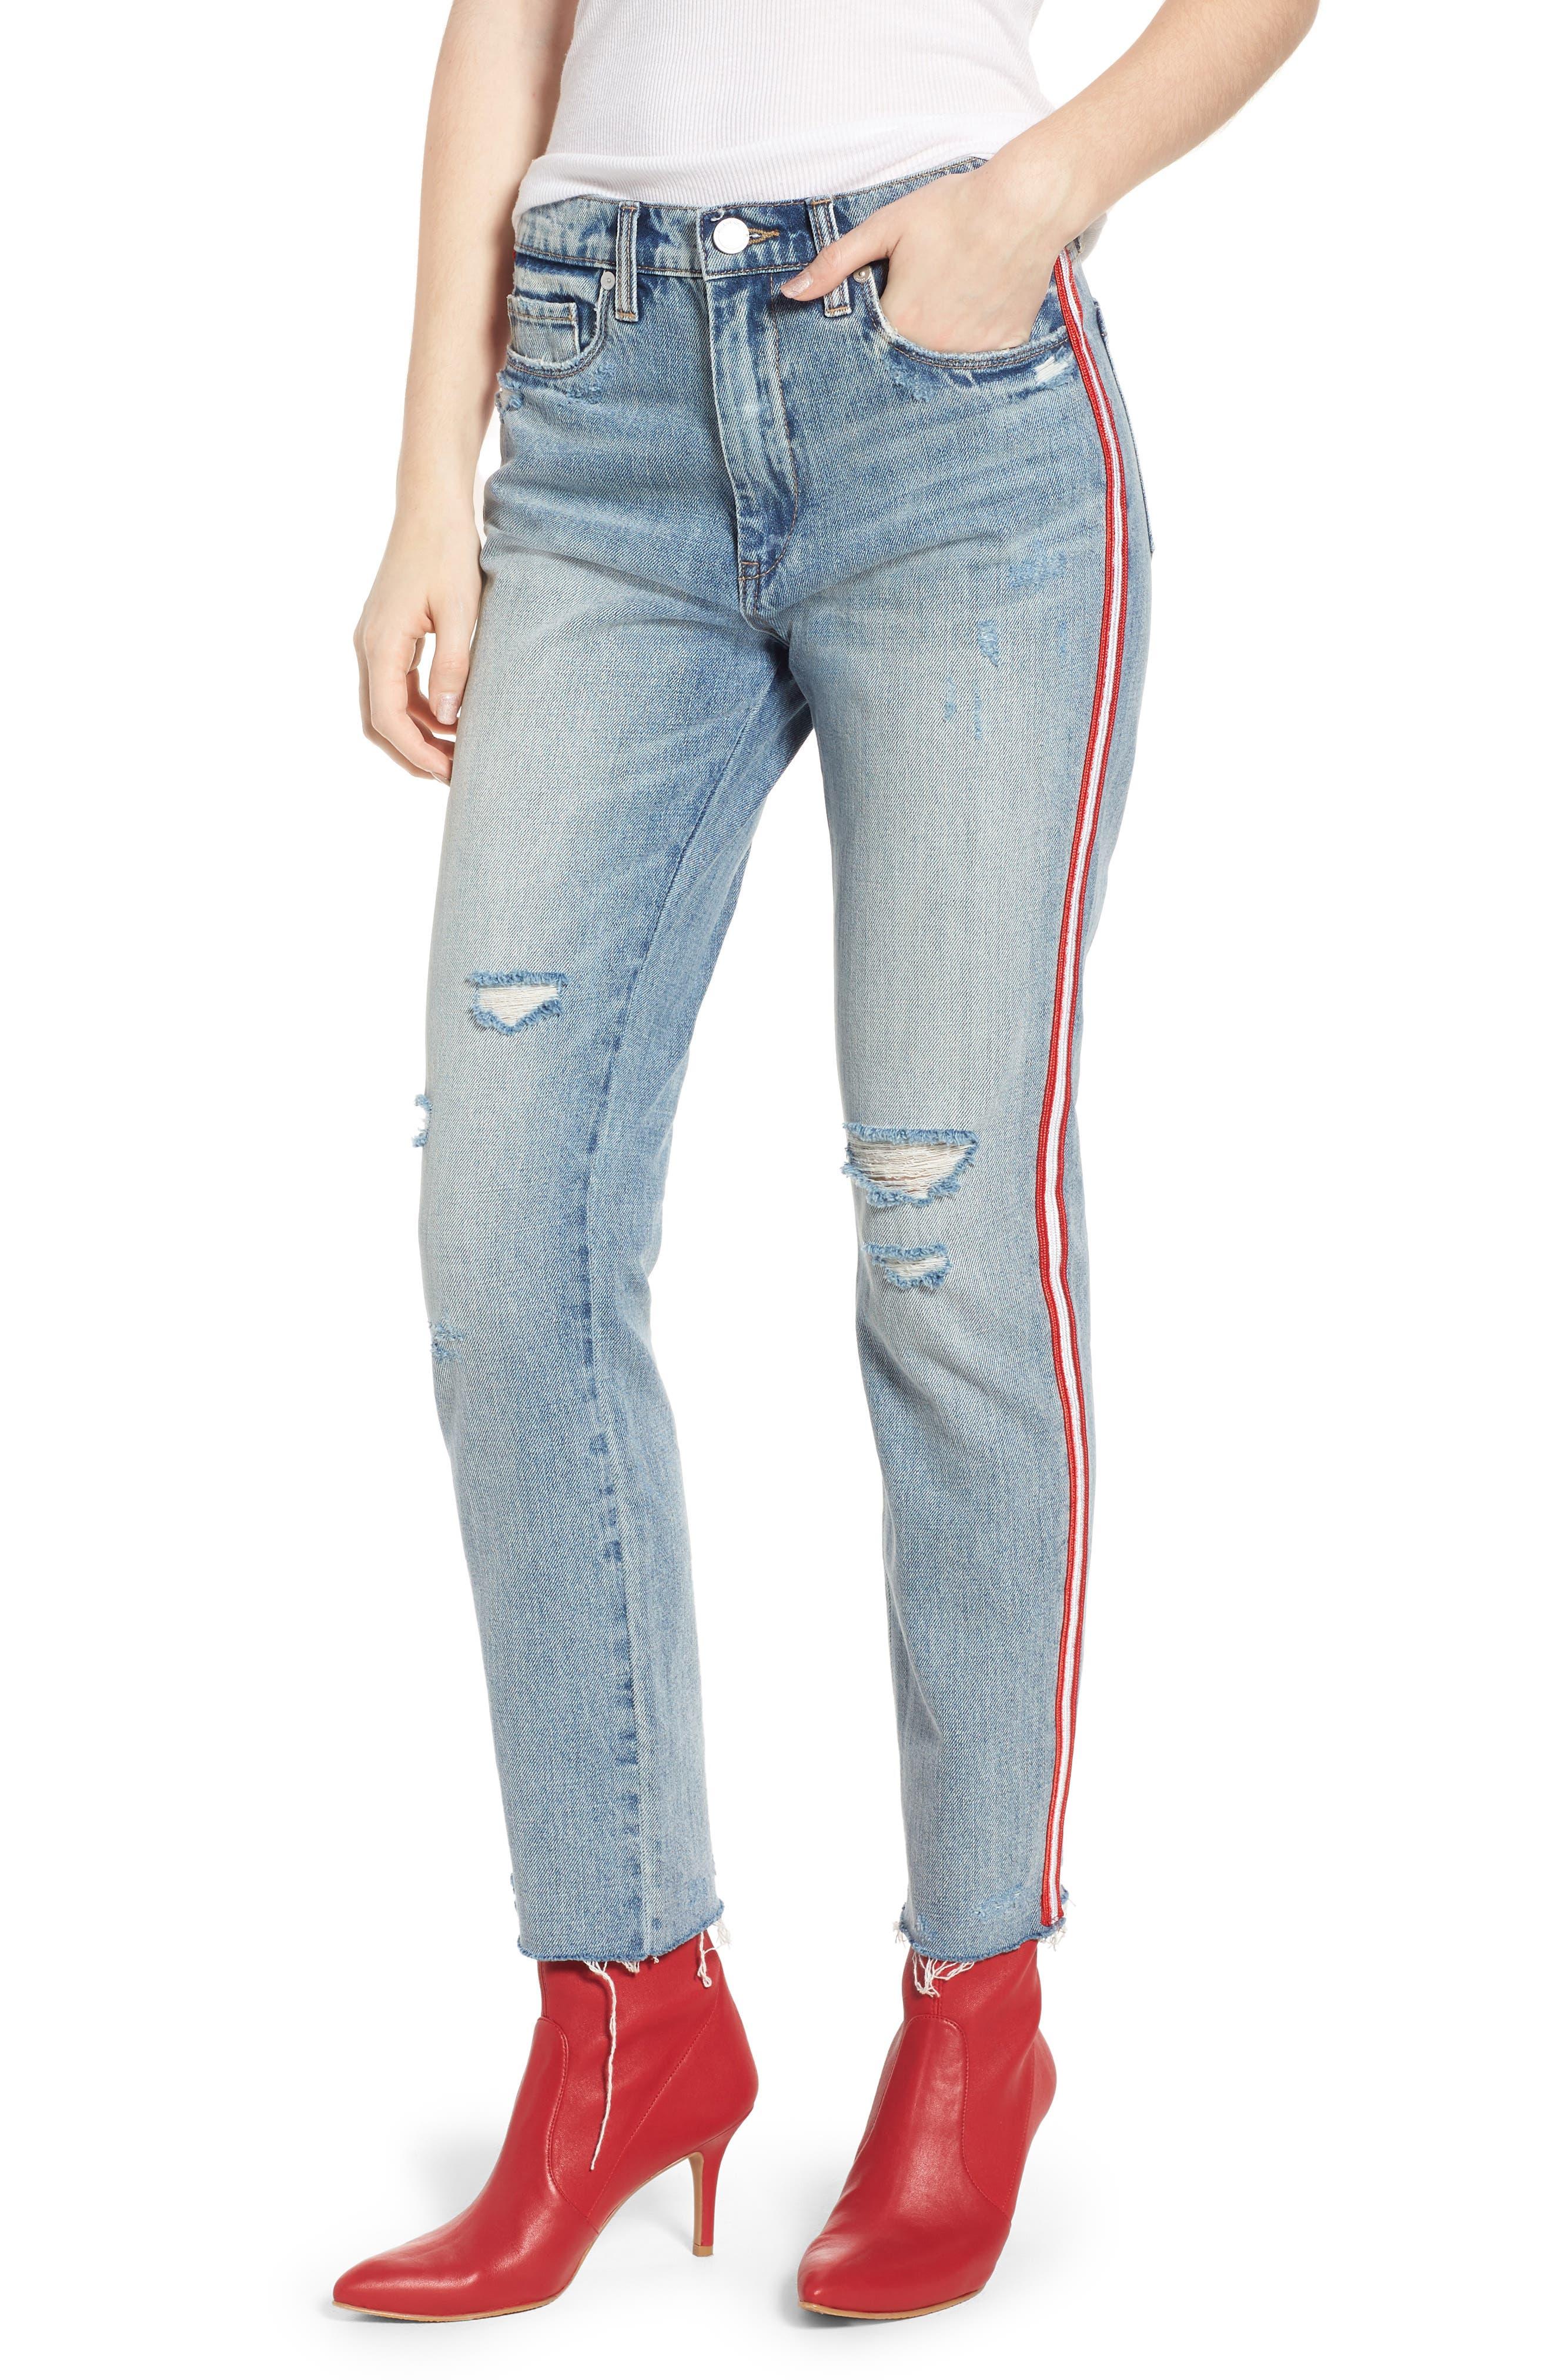 BLANKNYC Now or Never Side Stripe Skinny Jeans